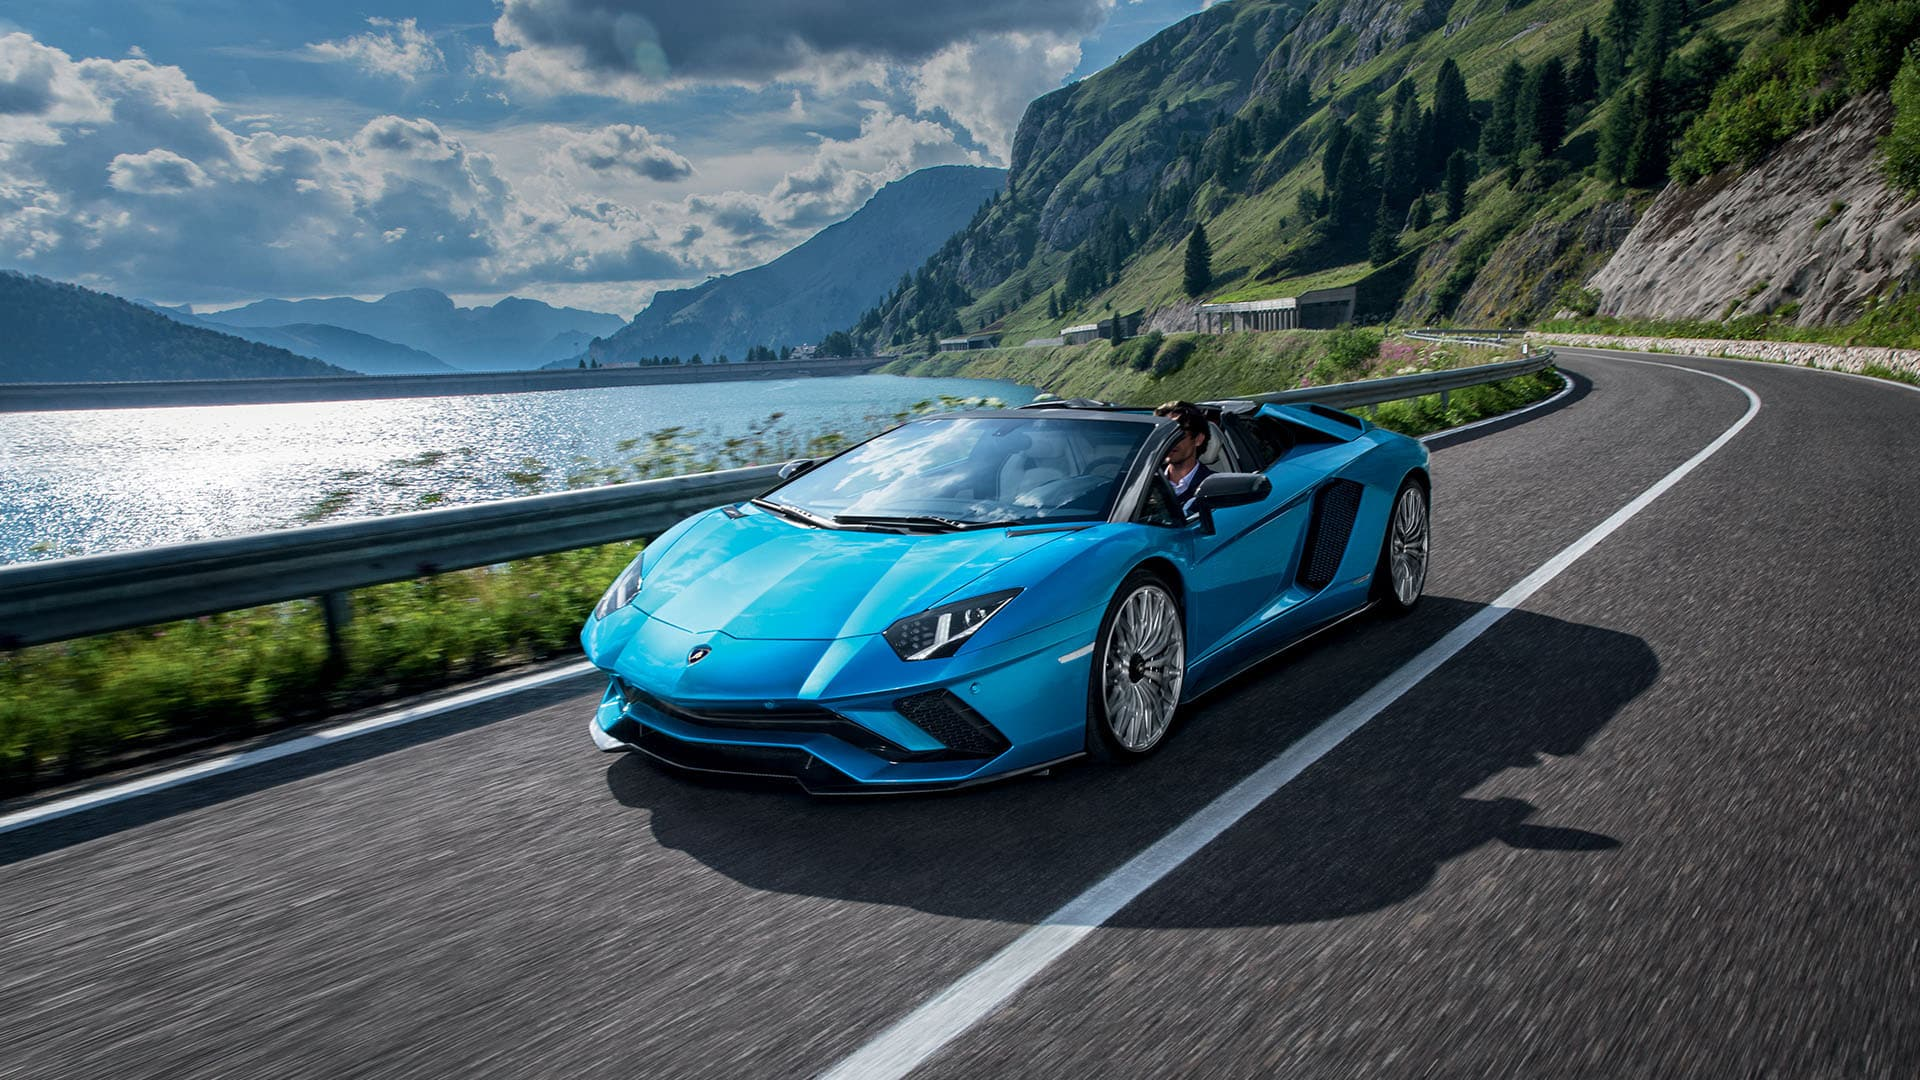 Exotics Sports Cars & Supercars